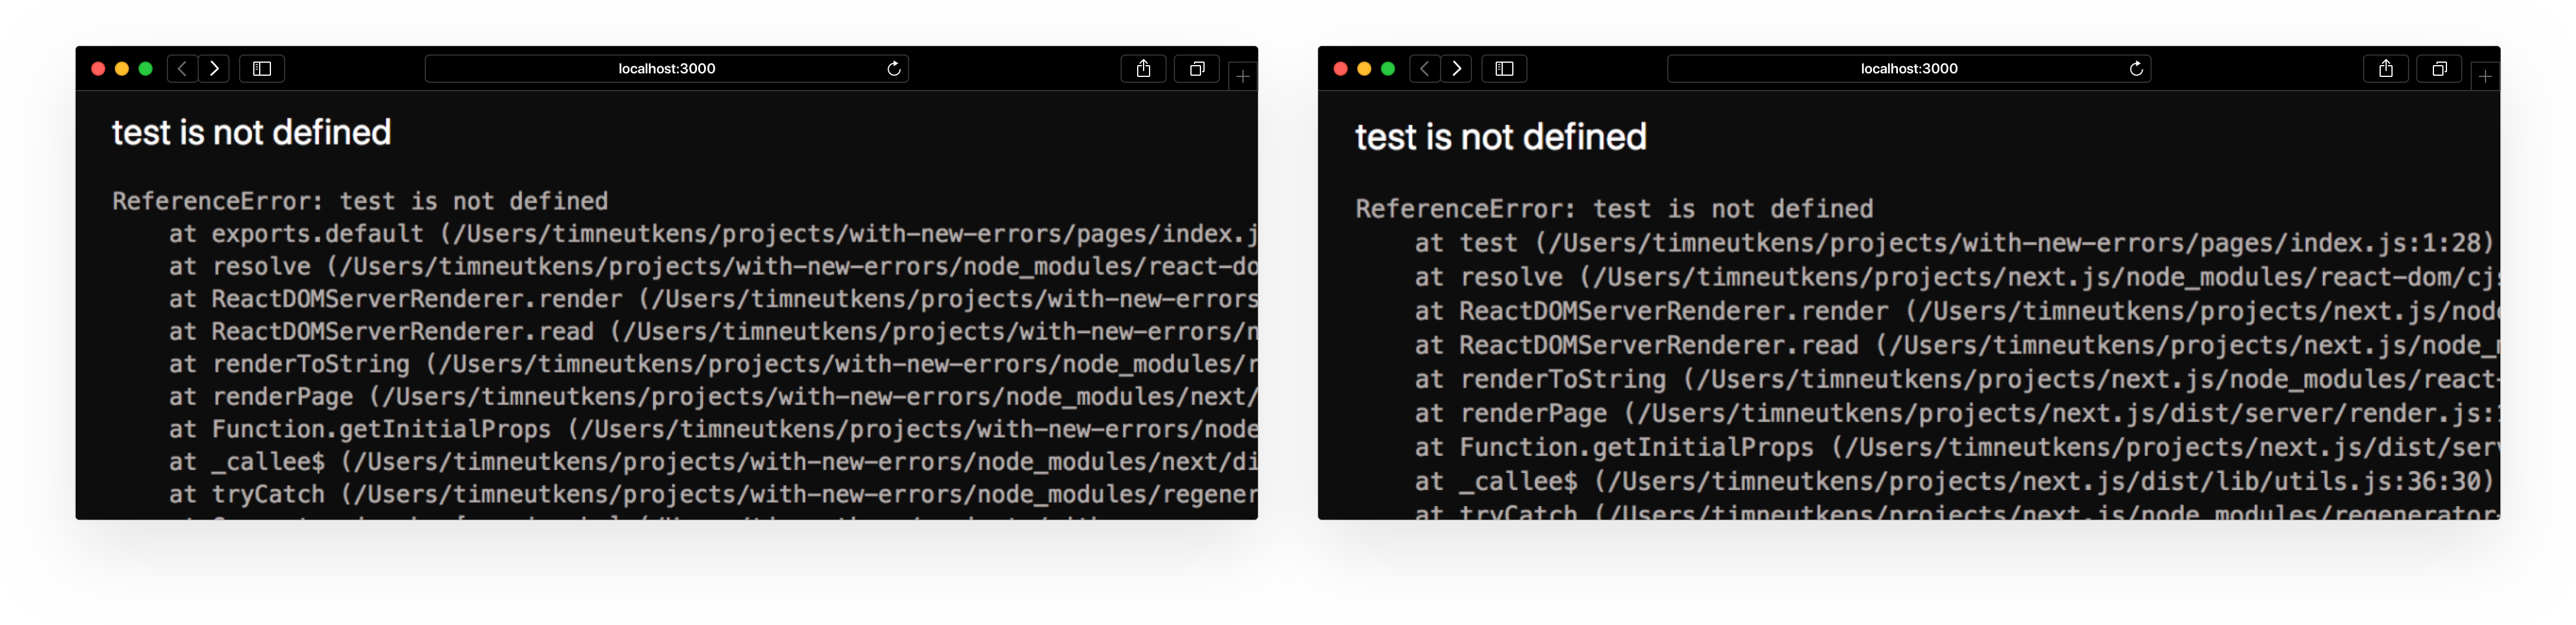 Blog - Next js 5: Universal Webpack, CSS Imports, Plugins